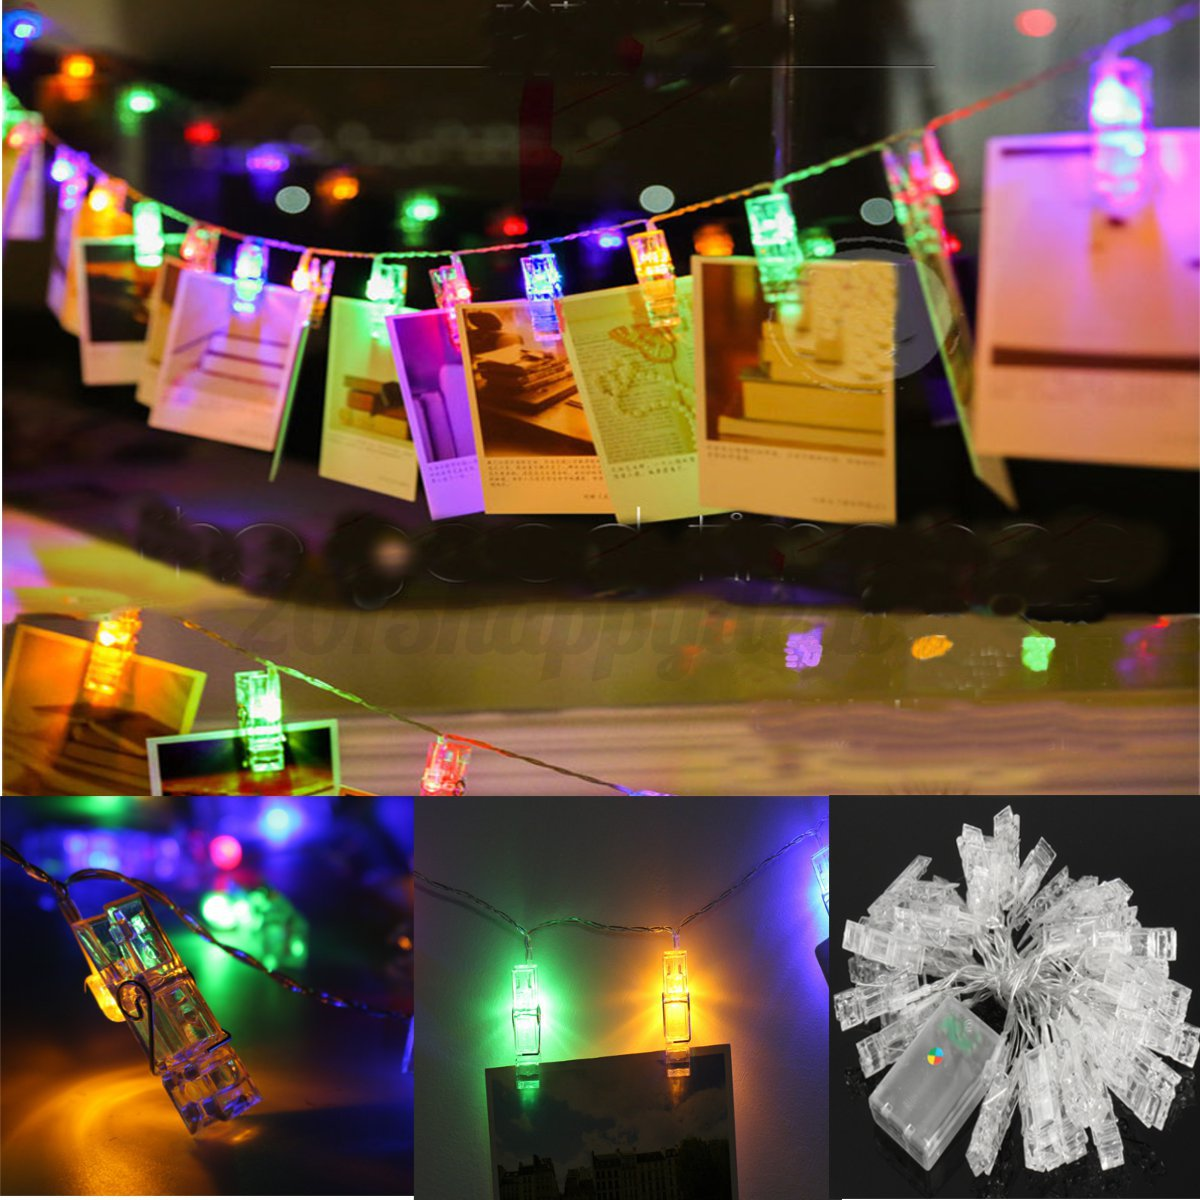 40 LED Hanging Picture Photo Peg Clip Fairy String Lights Wedding Window Decor eBay